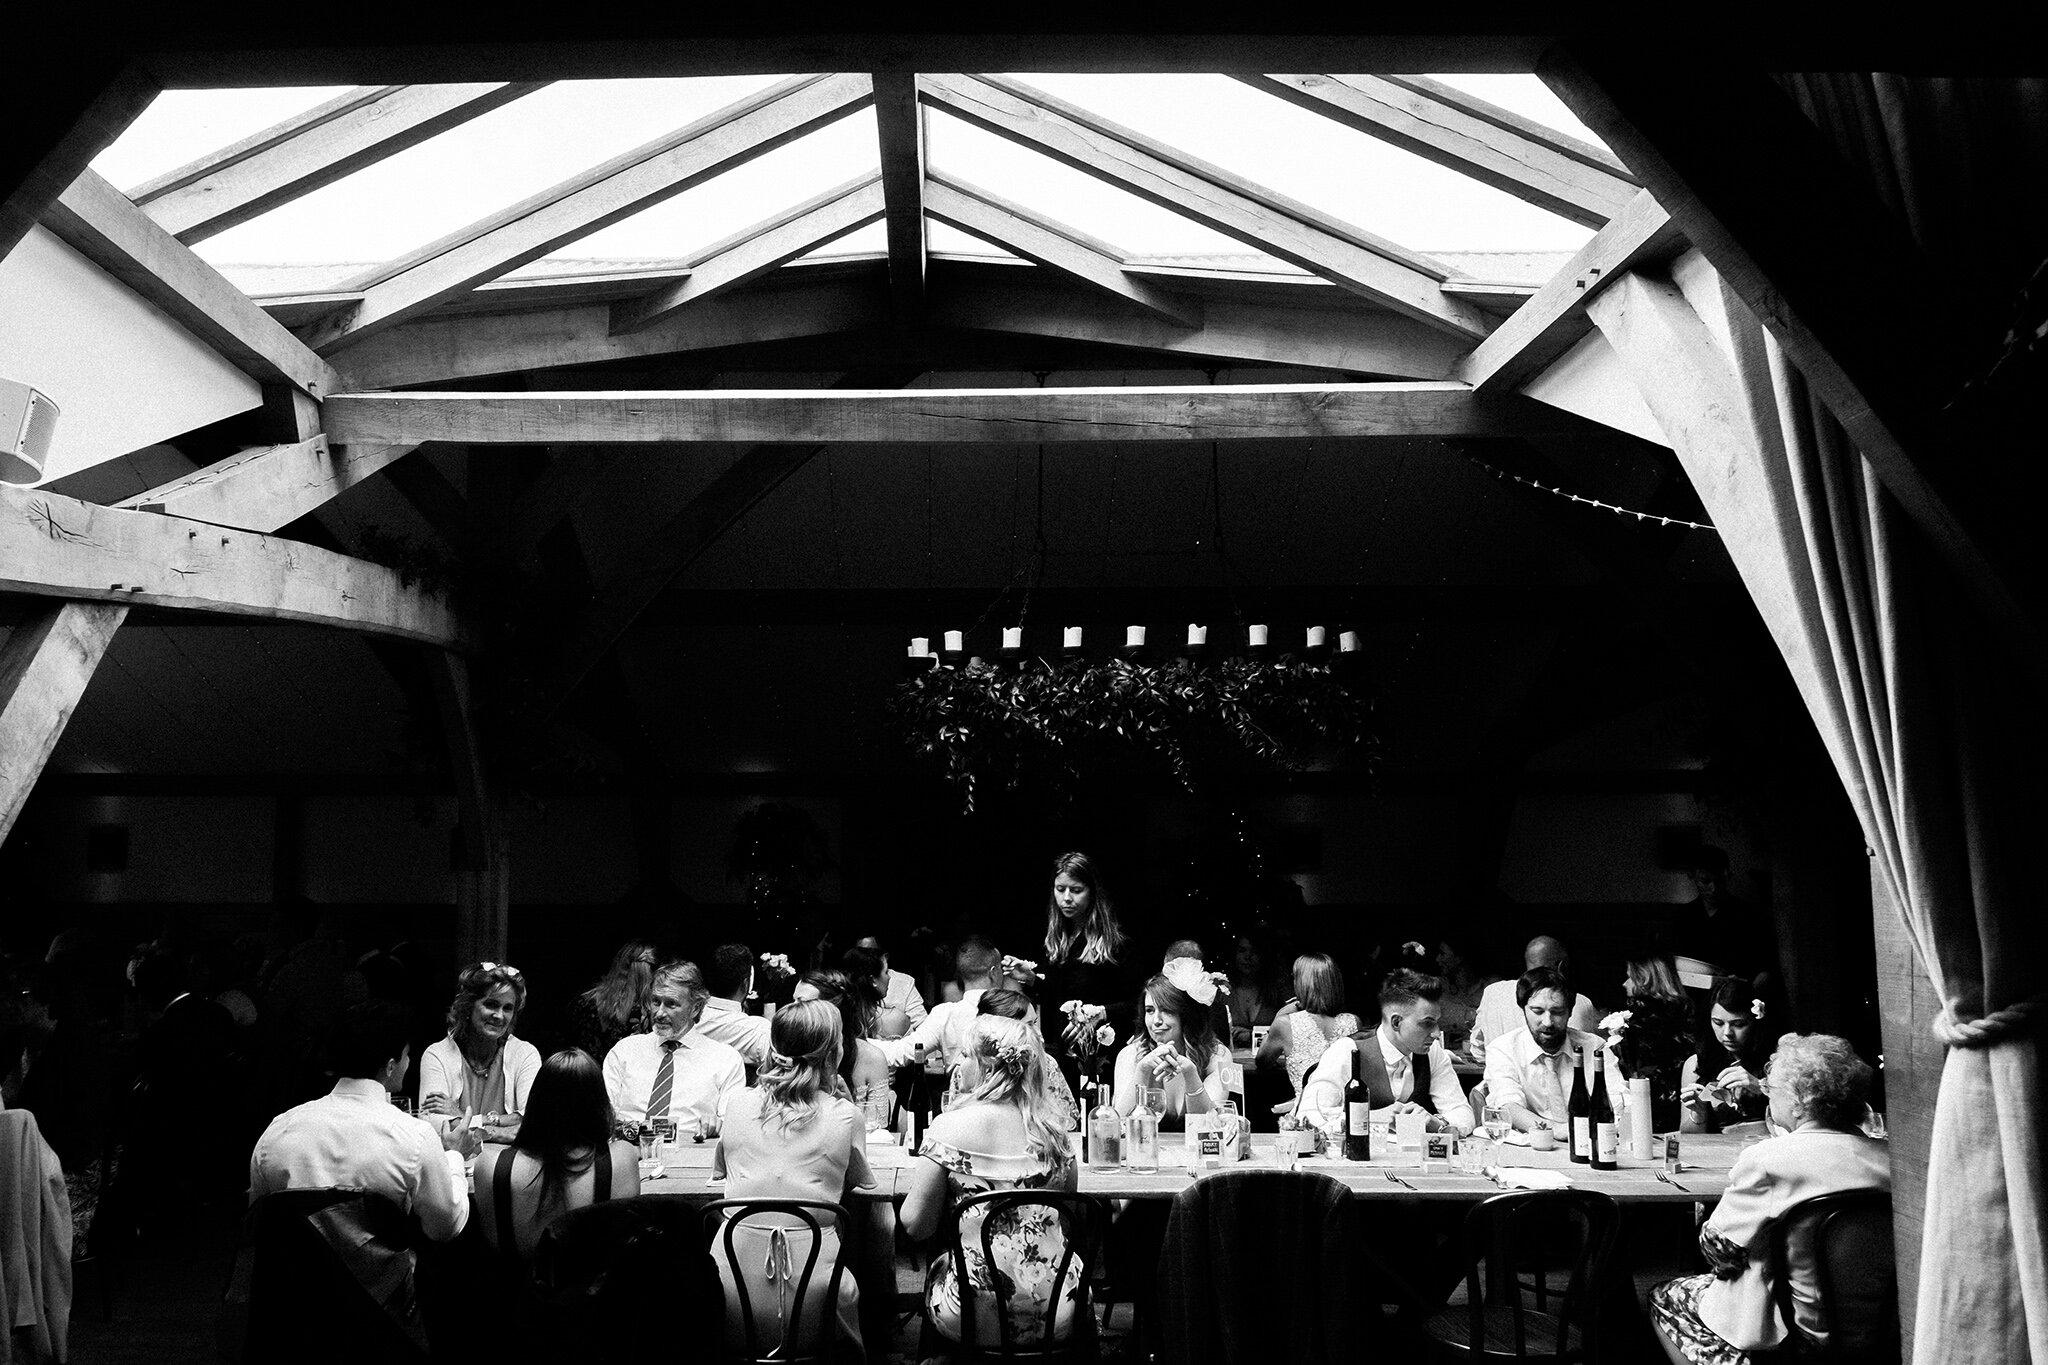 Scott-Stockwell-Photography-wedding-photographer-cripps-barn-table.jpg